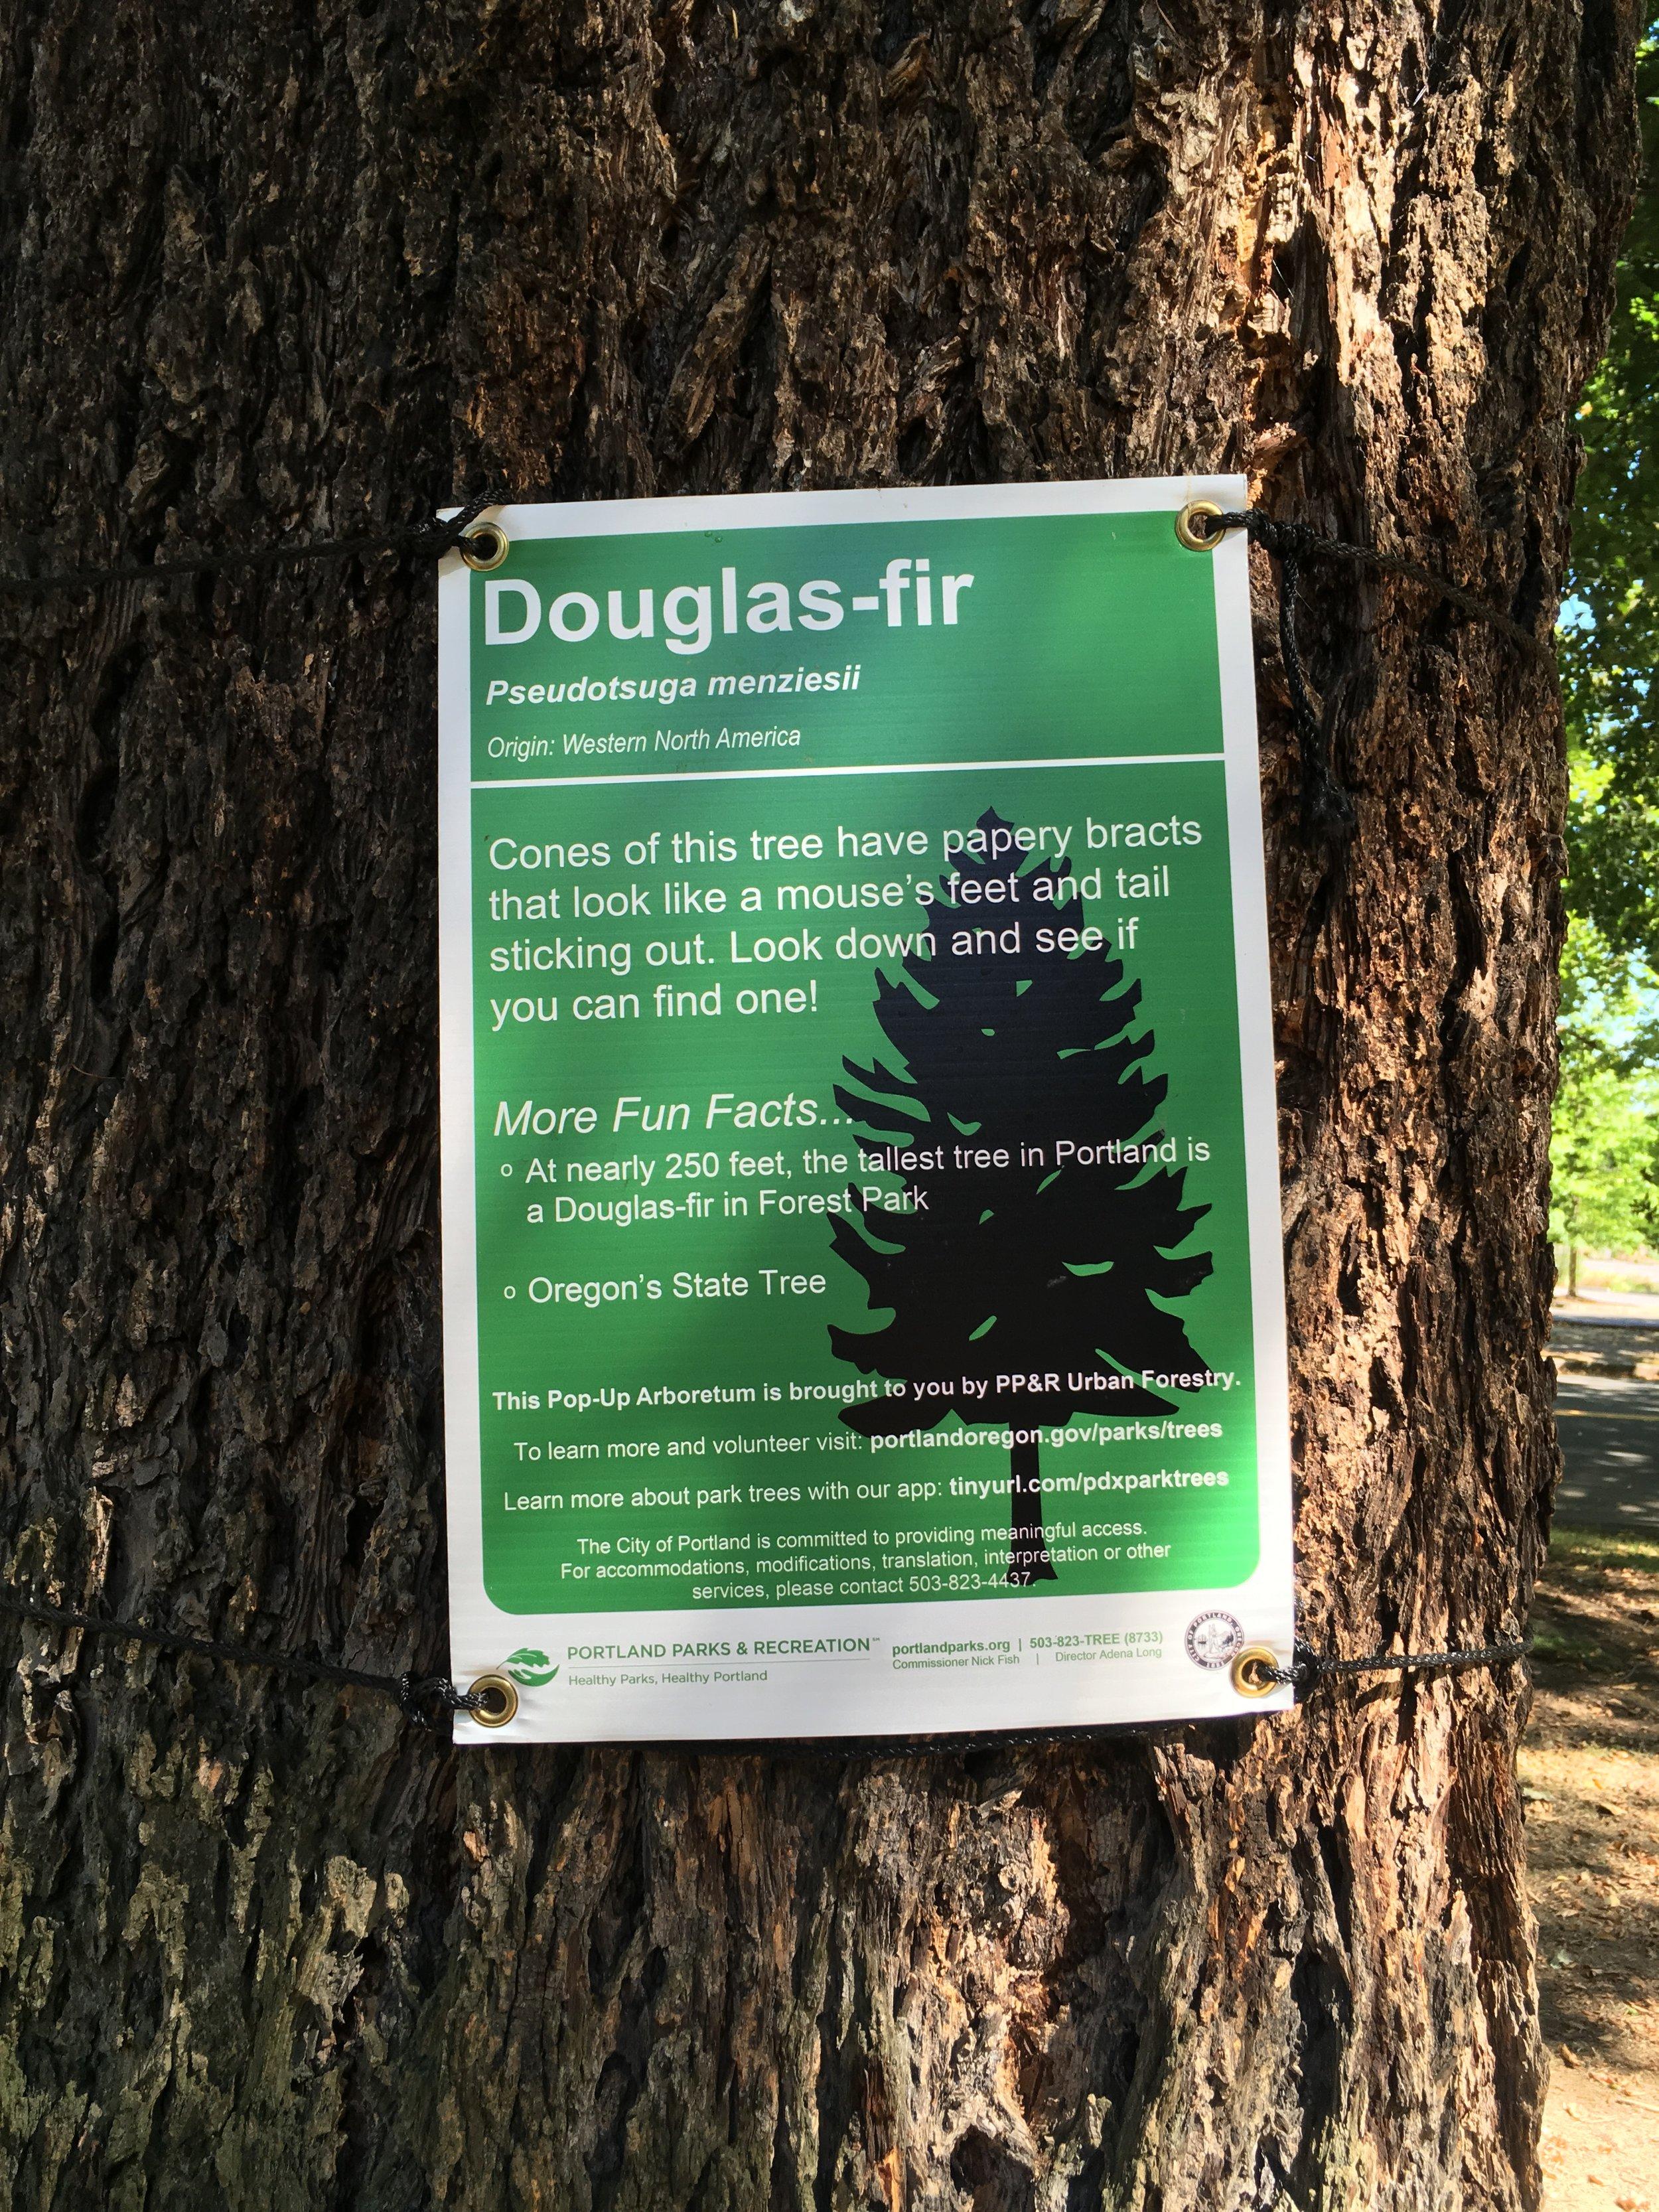 2019-09 Holladay Park Arborist Tree Sign 02 Douglas Fir.JPG